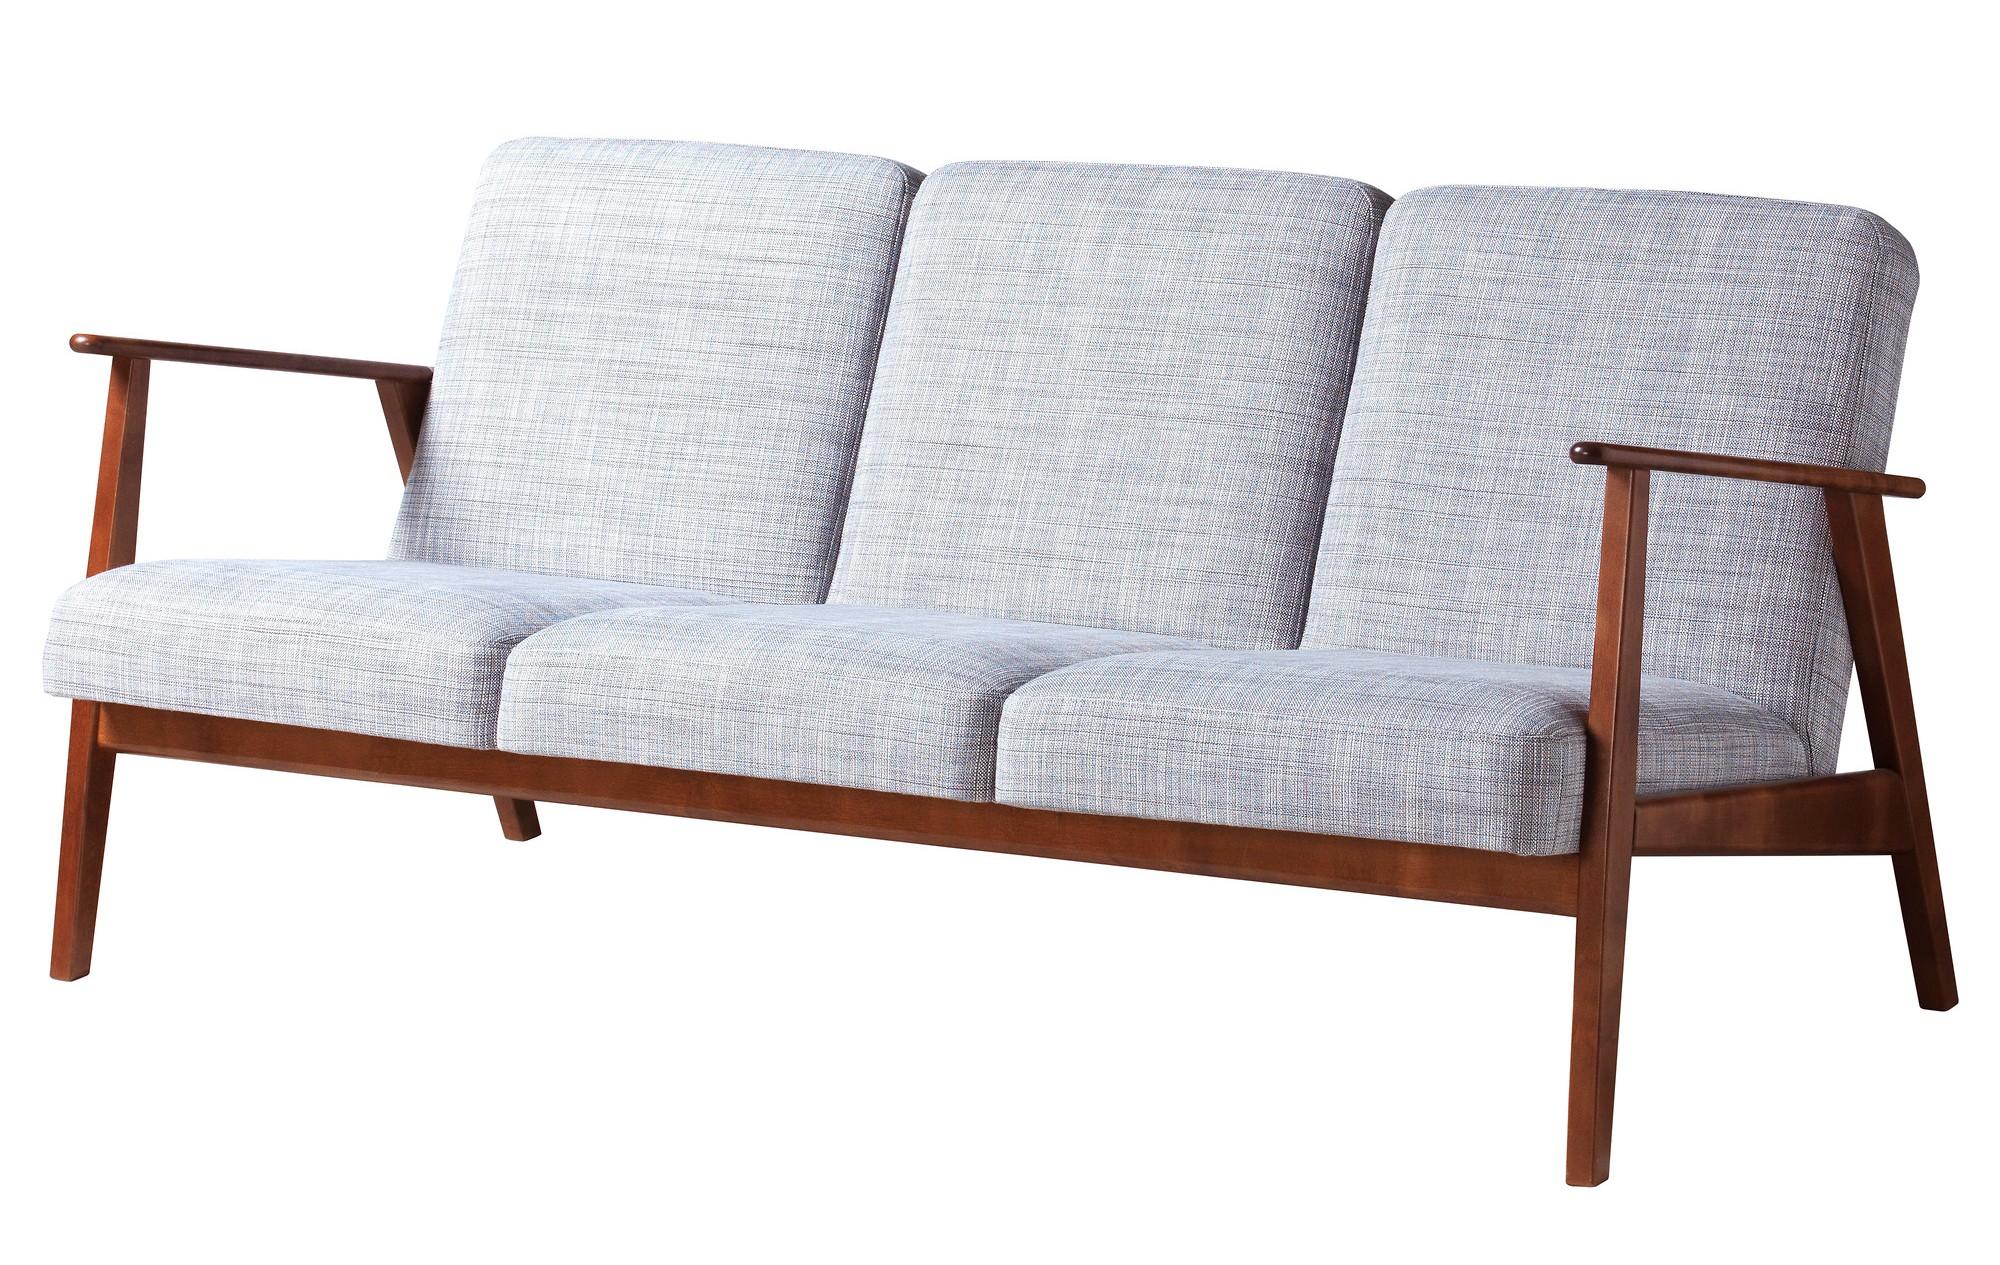 New ikea stocksund and eken set sofas for Canape 8 places ikea